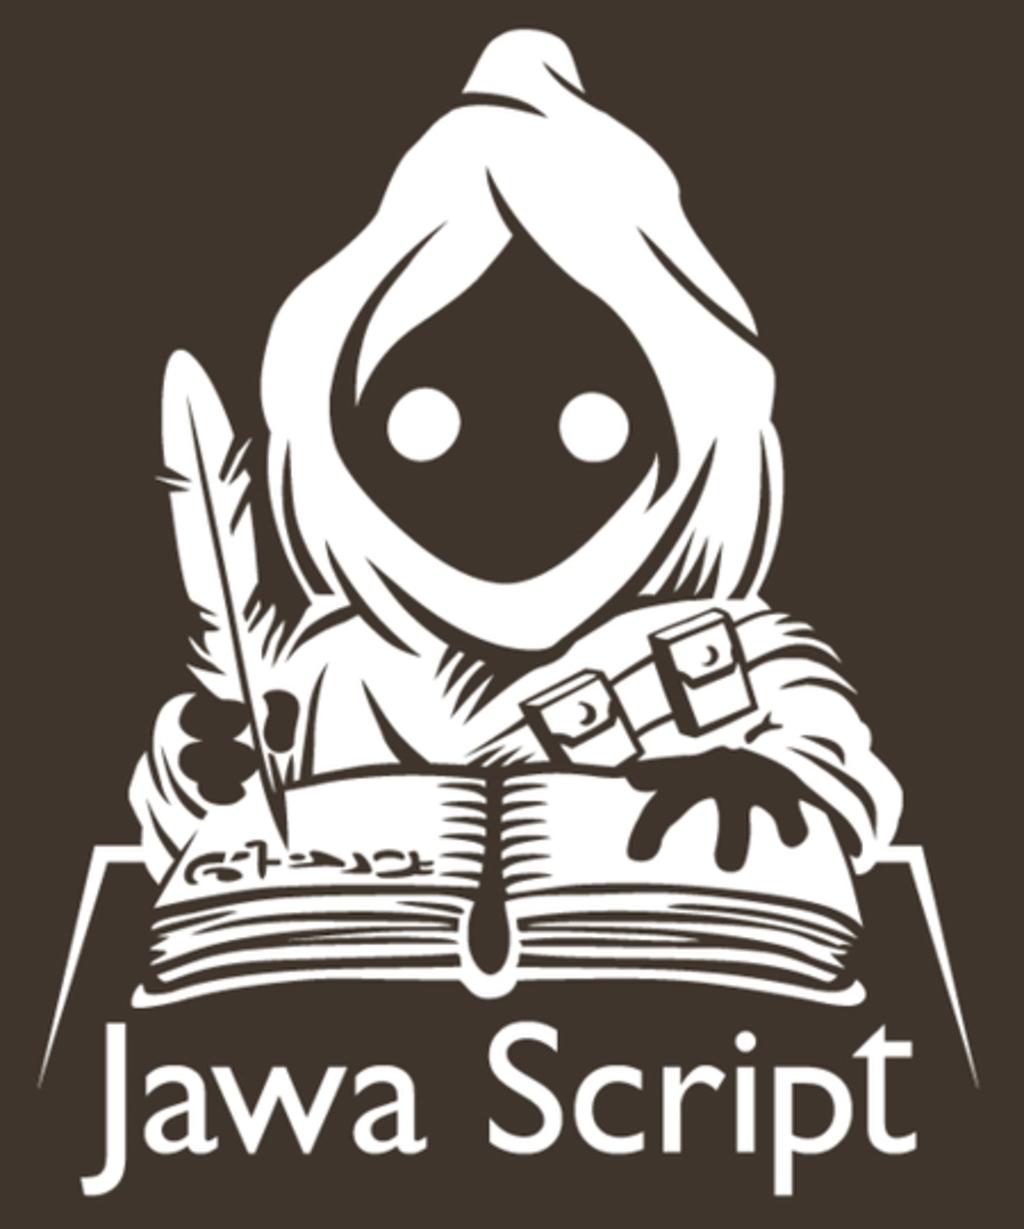 Qwertee: Jawa Script